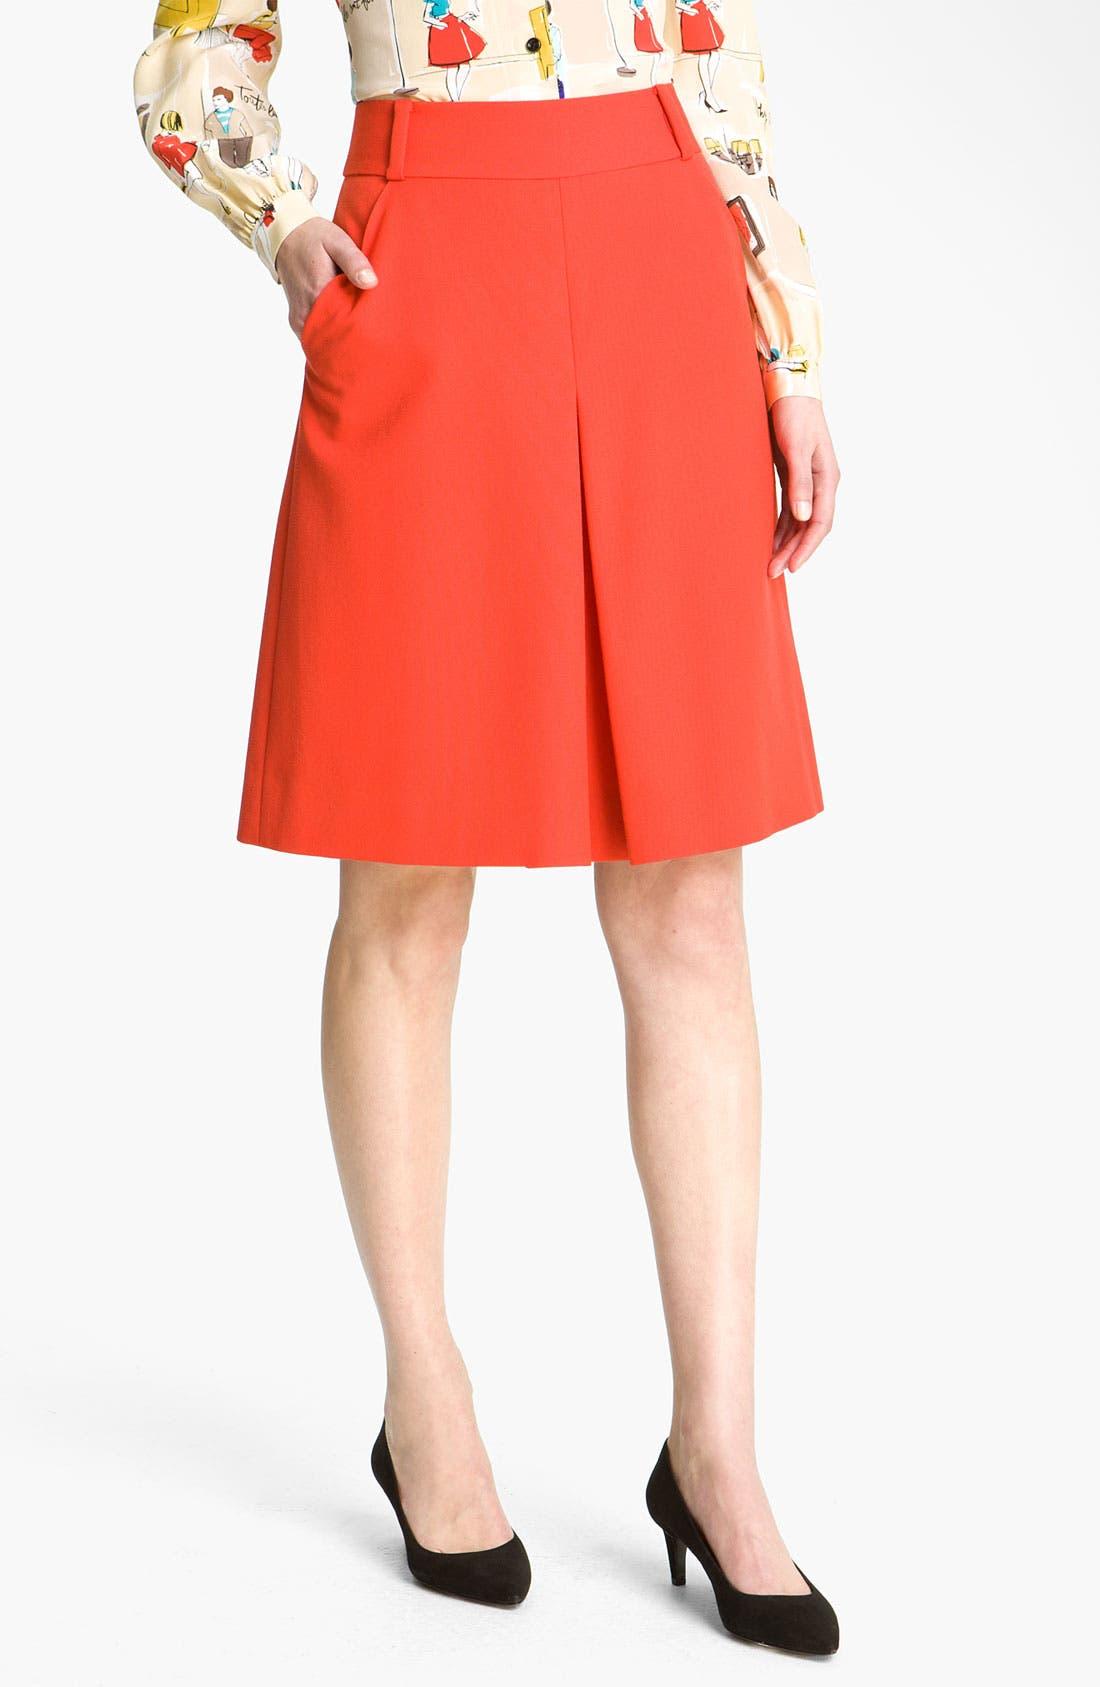 Alternate Image 1 Selected - kate spade new york 'mollie' skirt